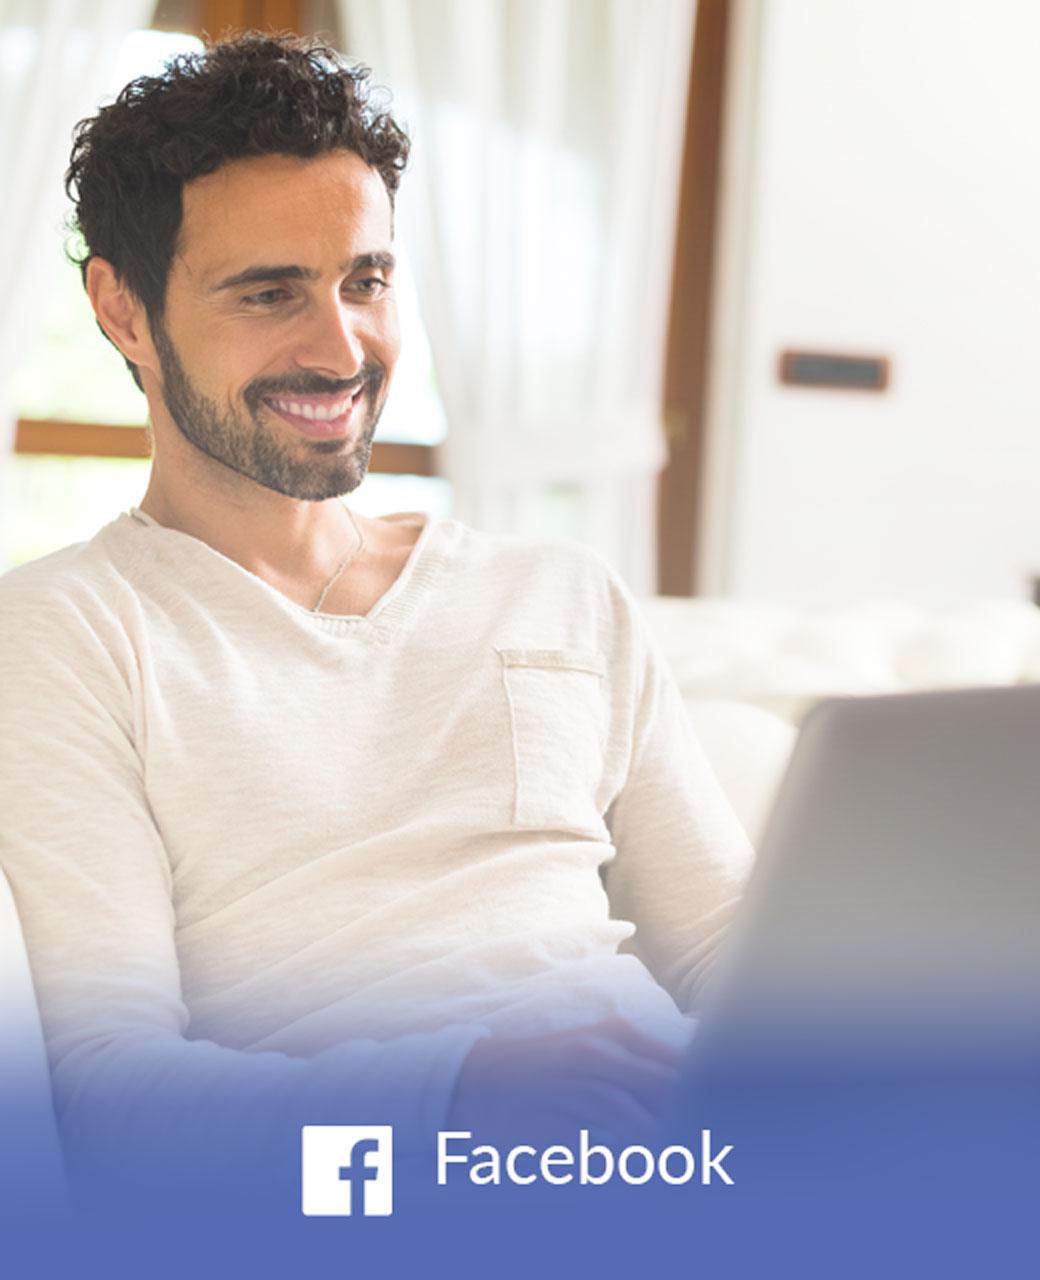 ELI Facebook